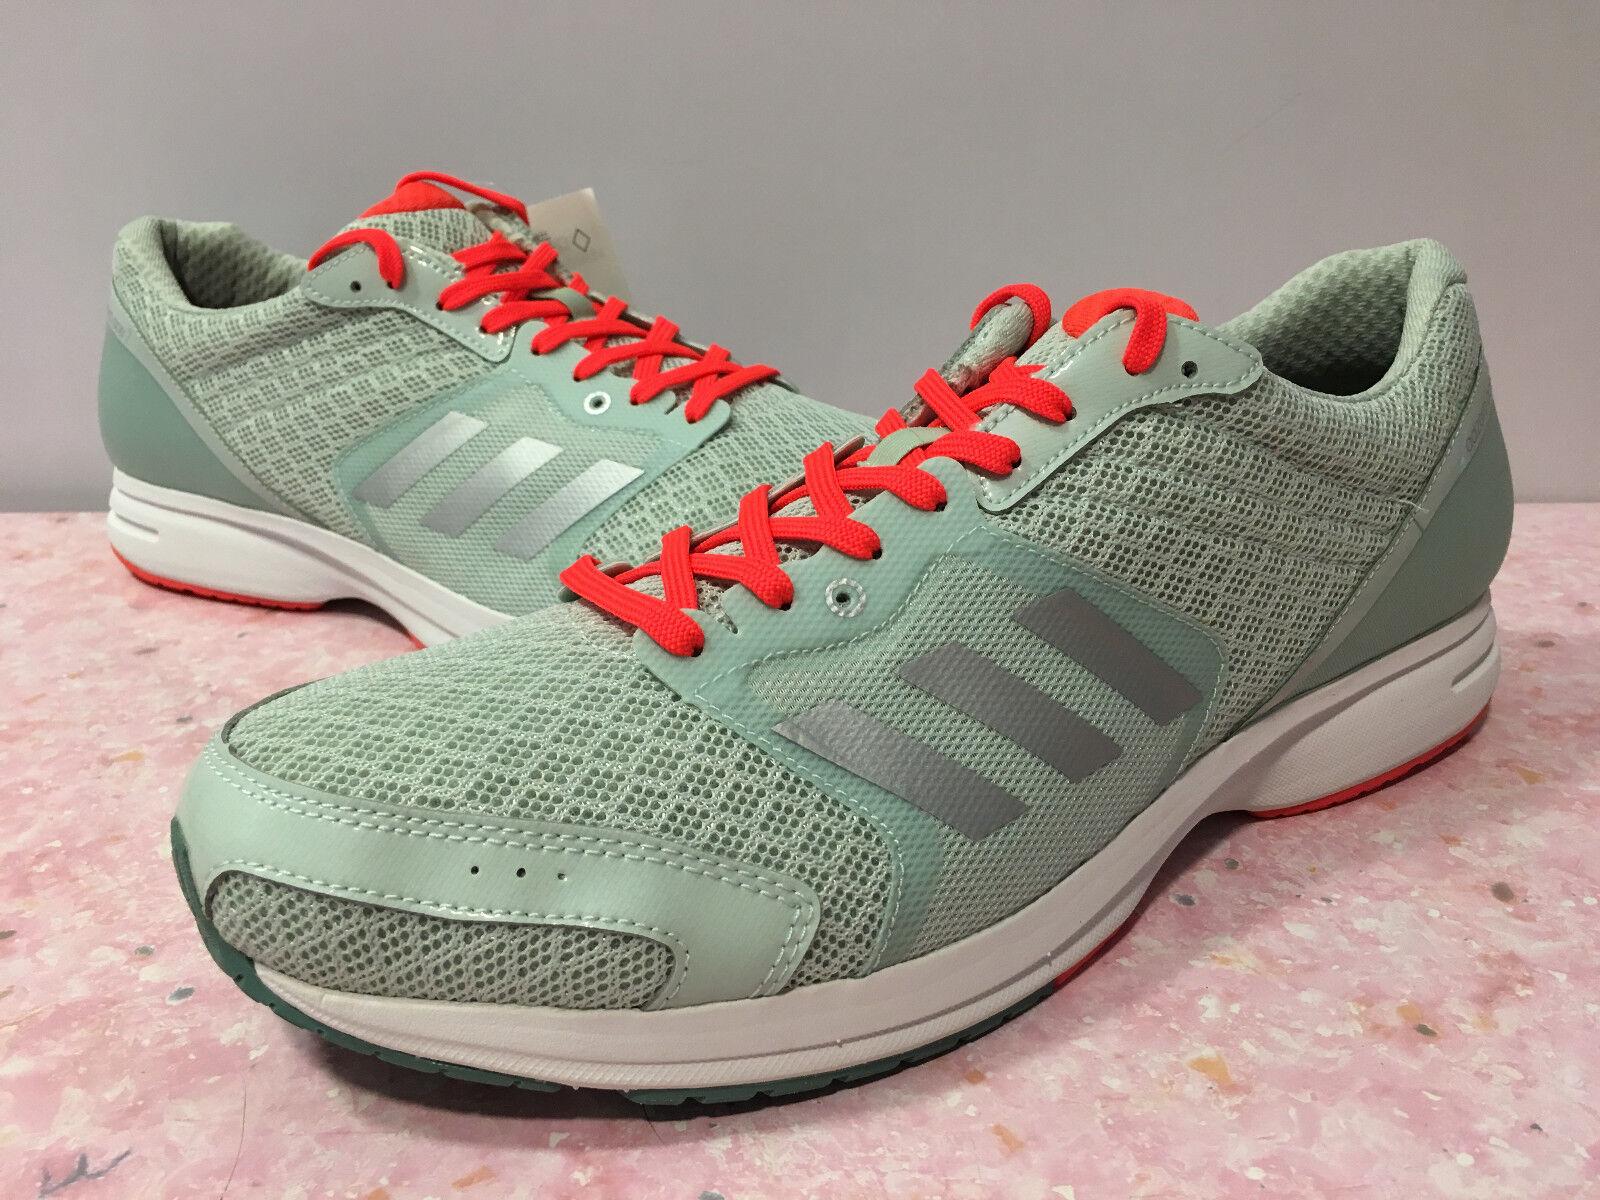 Adidas Adizero Ace 7 Marathon Training Running shoes AQ2415